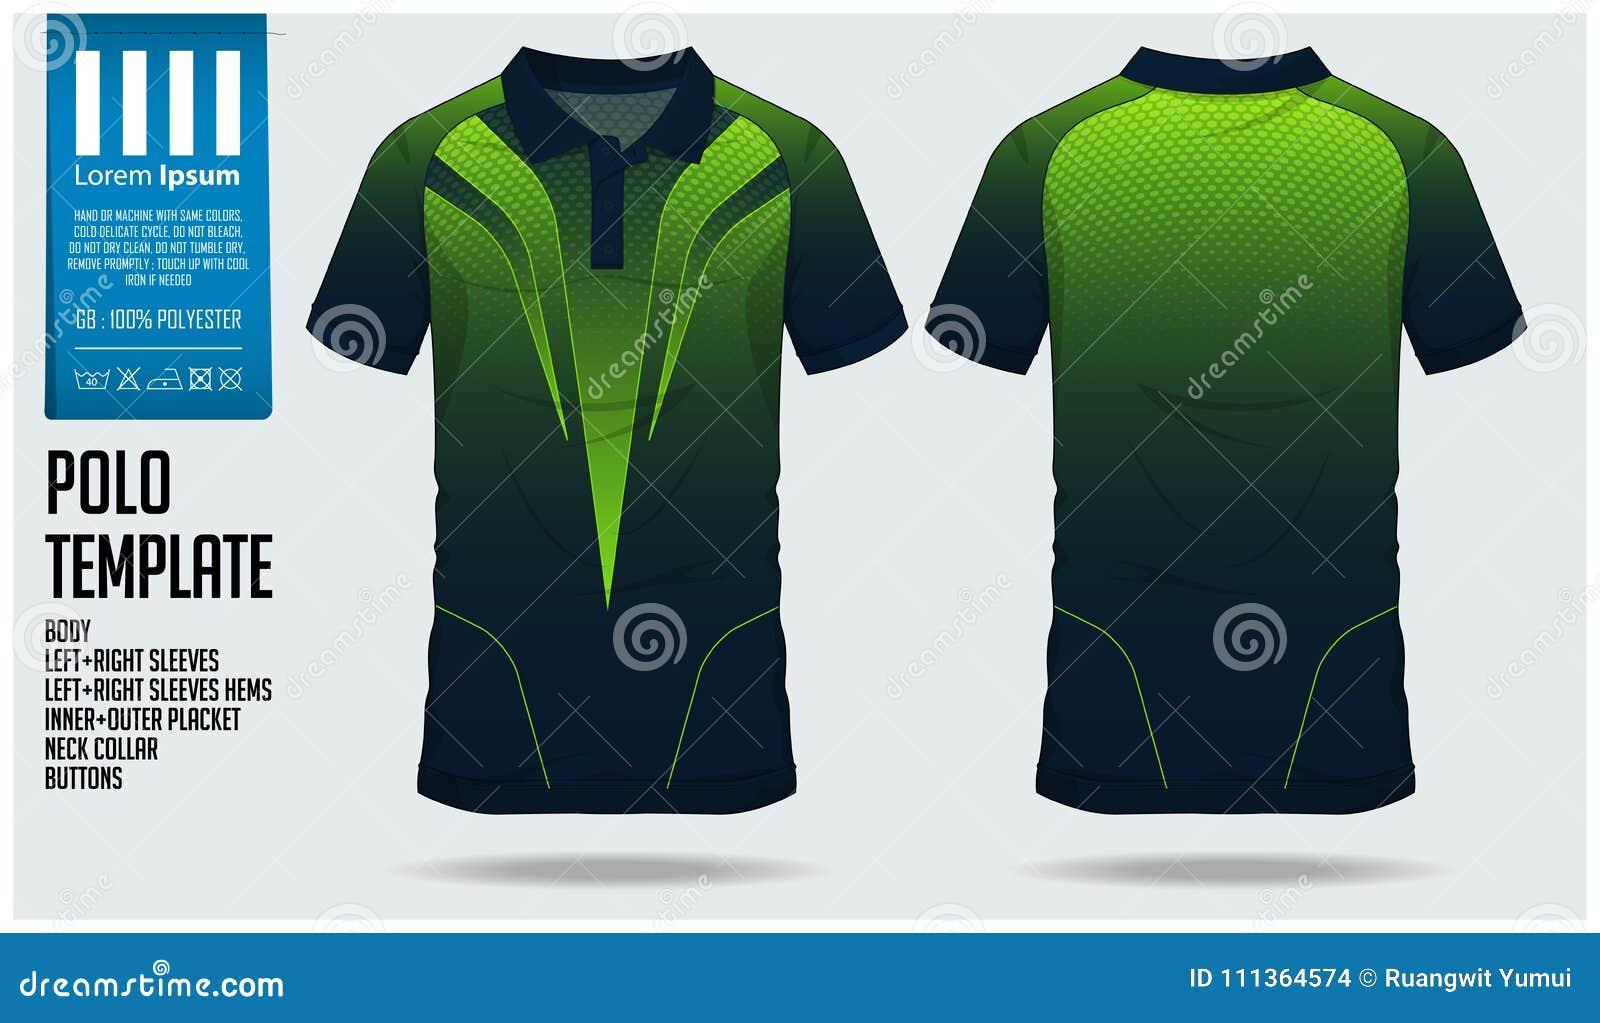 9291297d581 Polo T Shirt Sport Design Template For Soccer Jersey